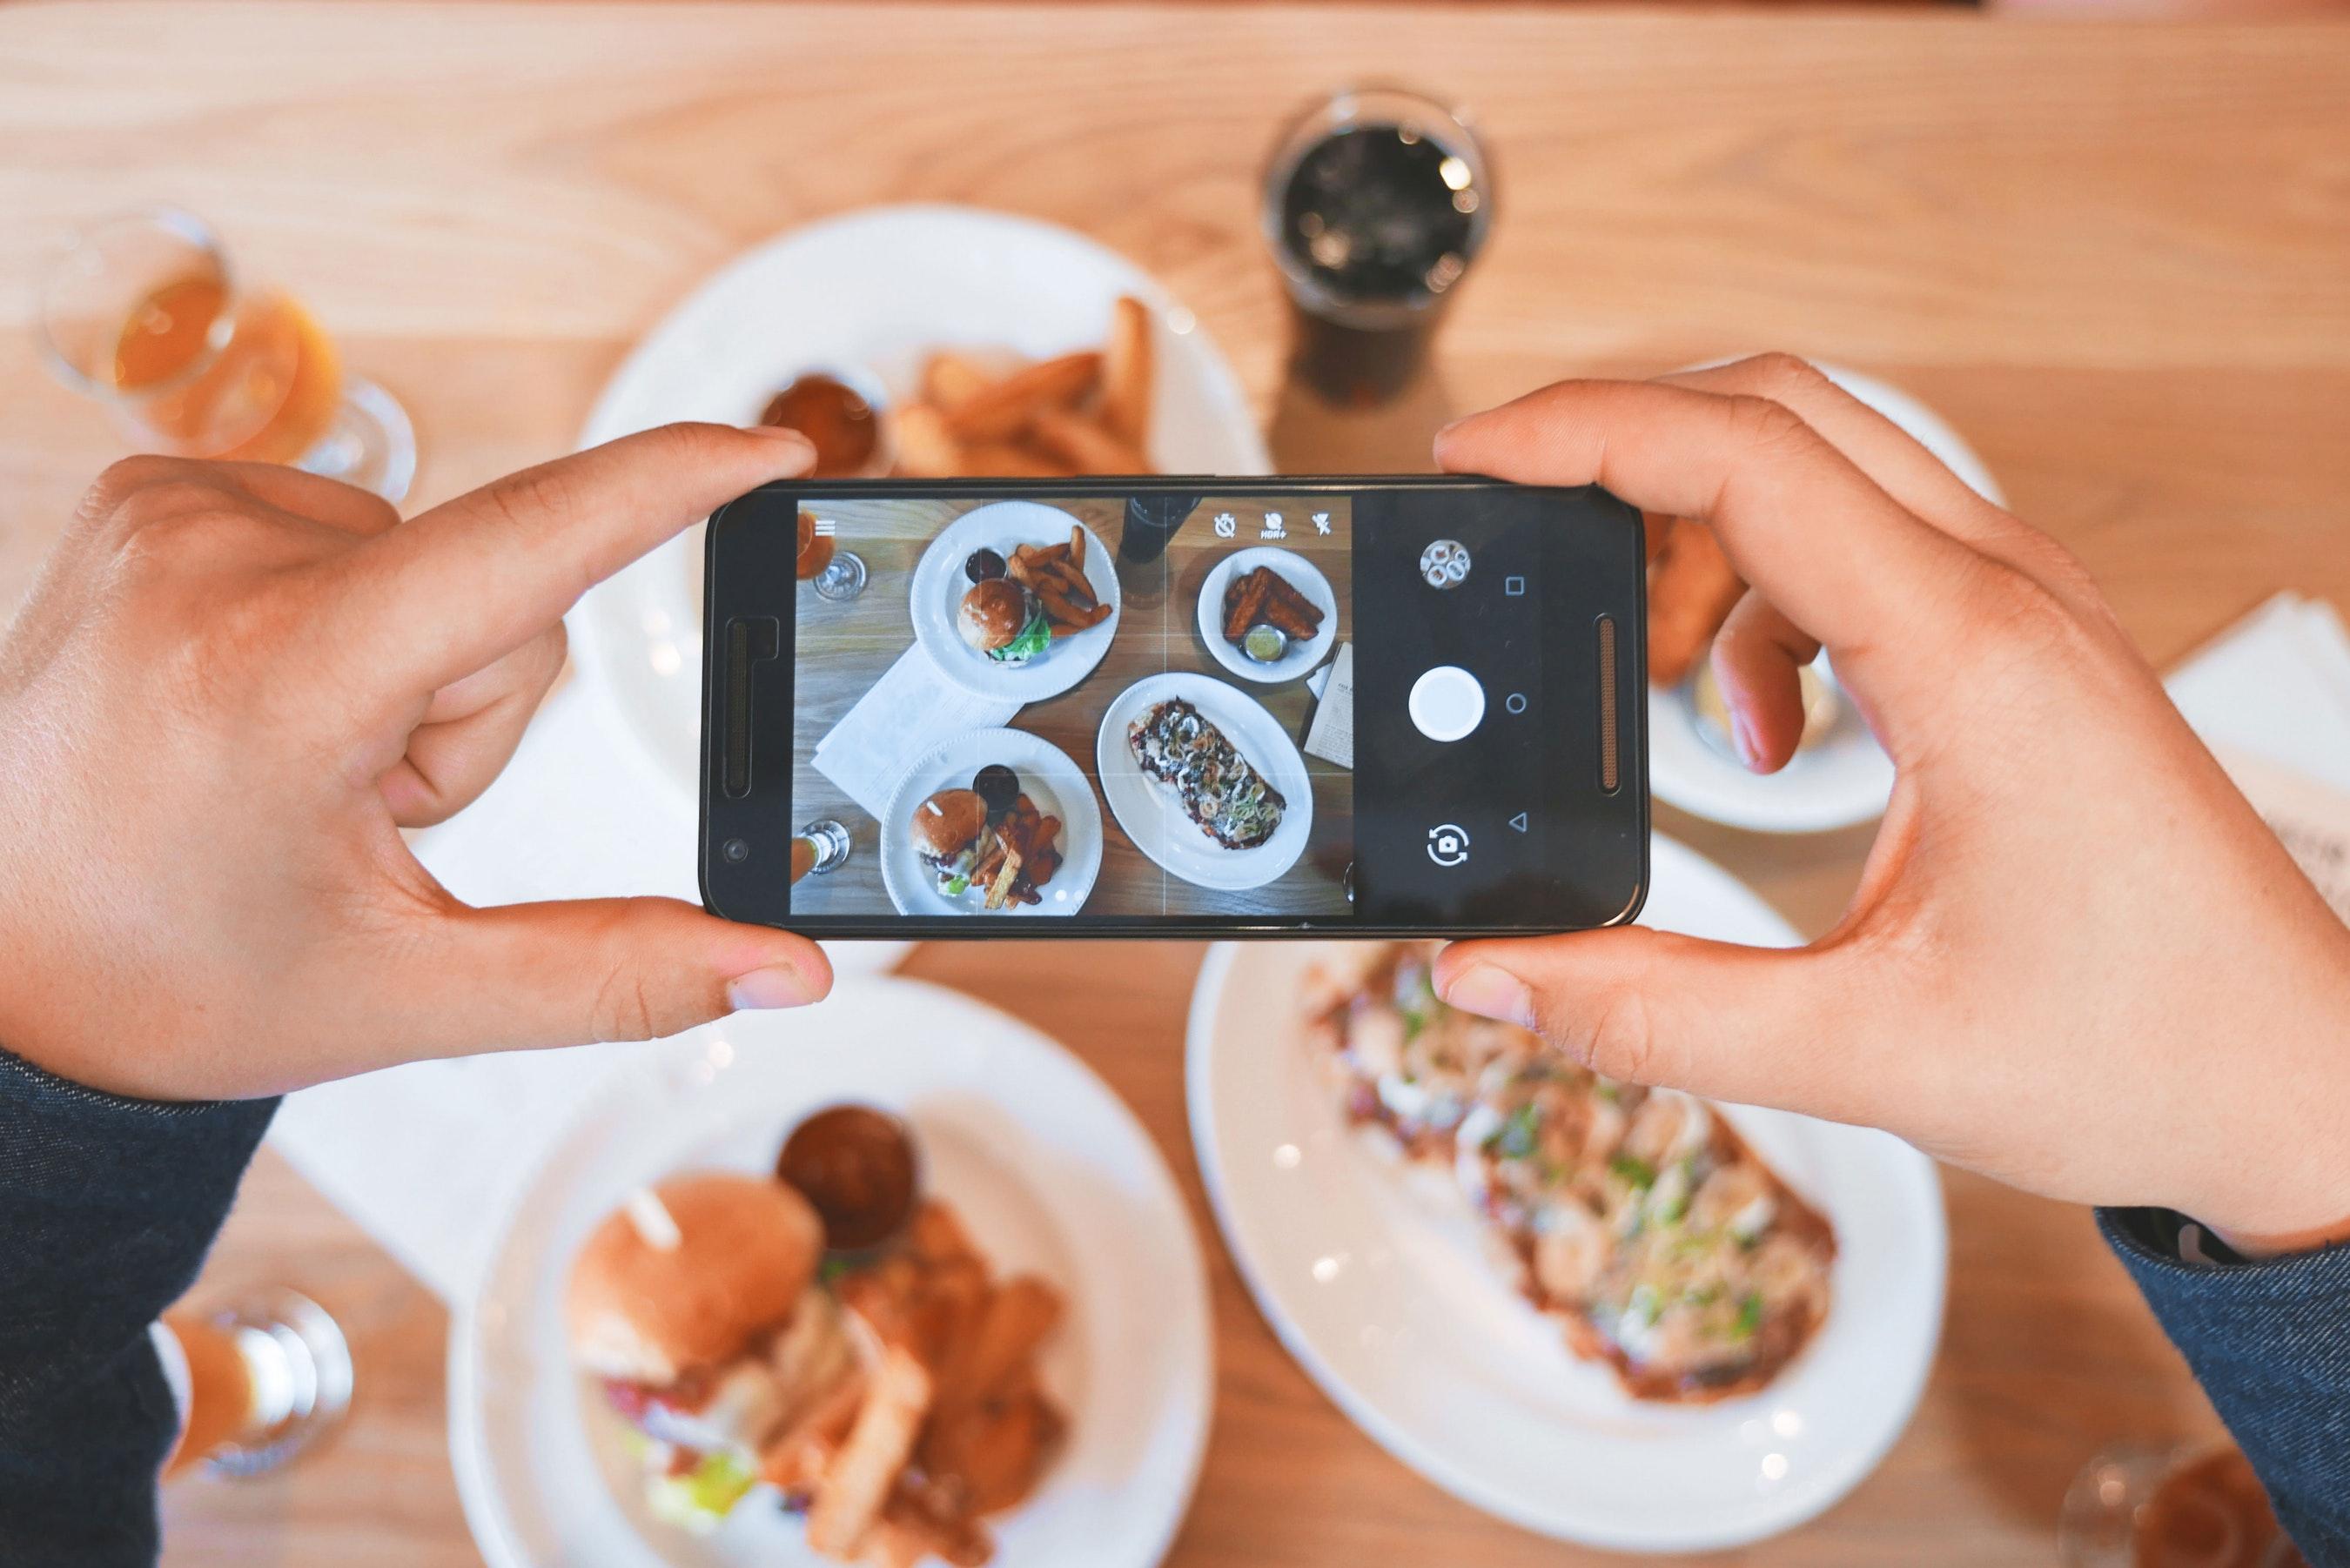 「instagramの乗っ取り方法」は「乗っ取り対策」より強いのか